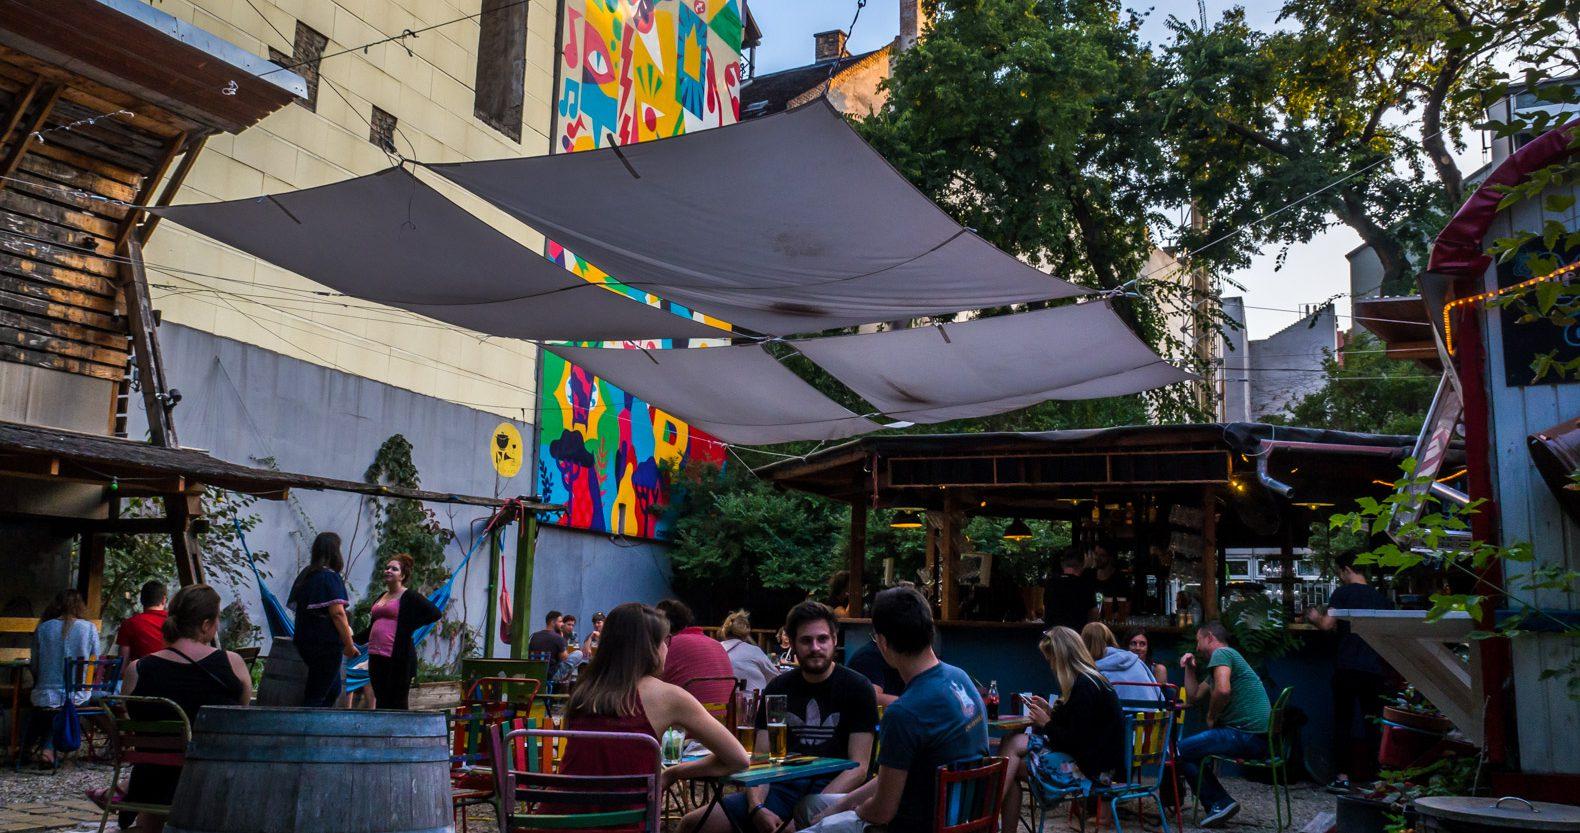 Koleves Kert ruin pub in Budapest